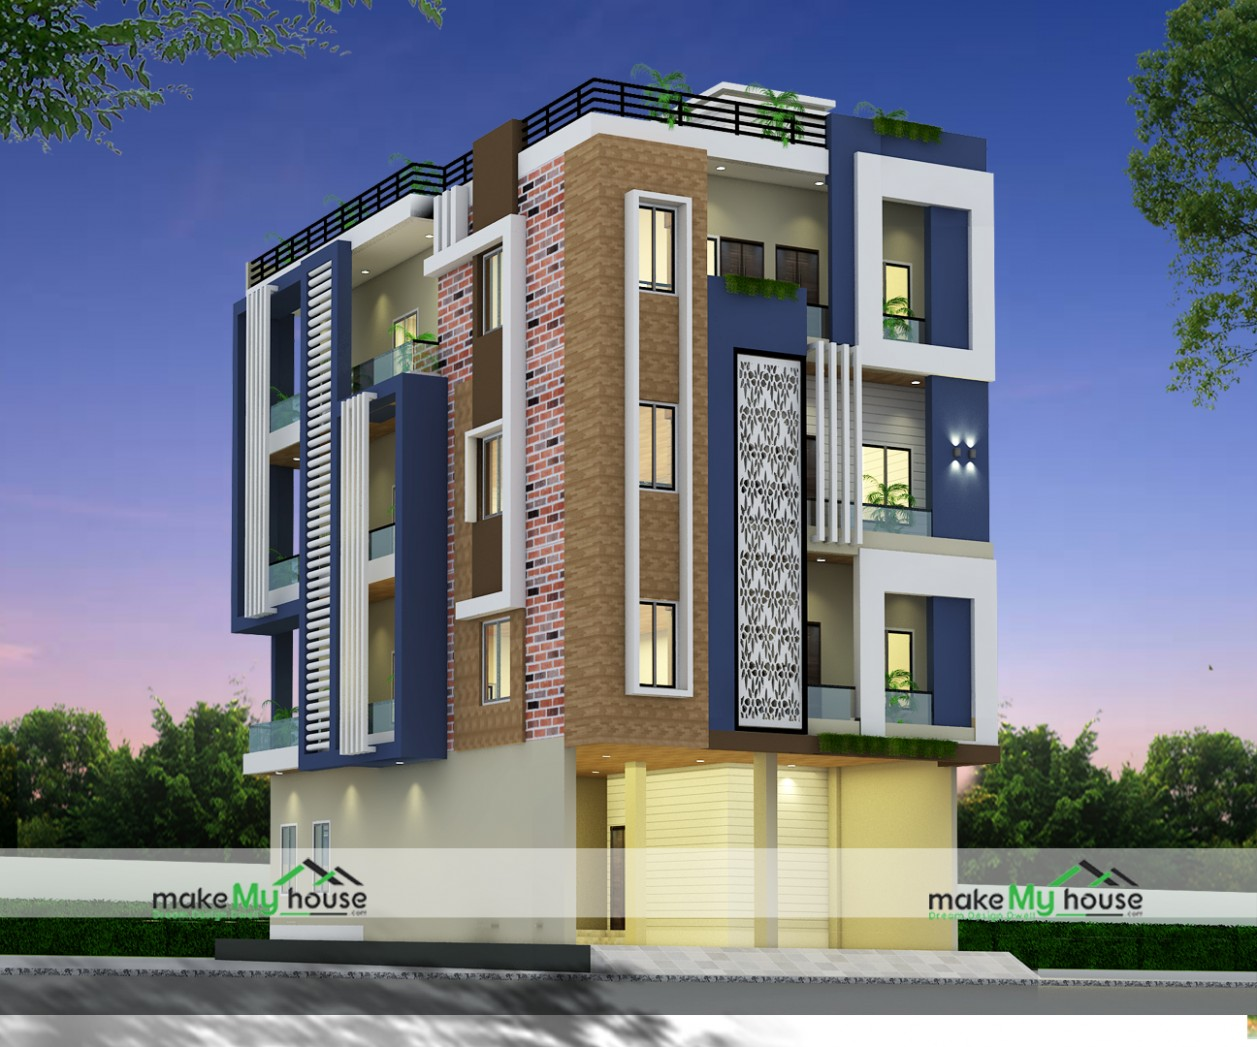 11X11 Multistory Apartment Plan  11 SqFt Multistory Apartment  - Apartment Design Elevation